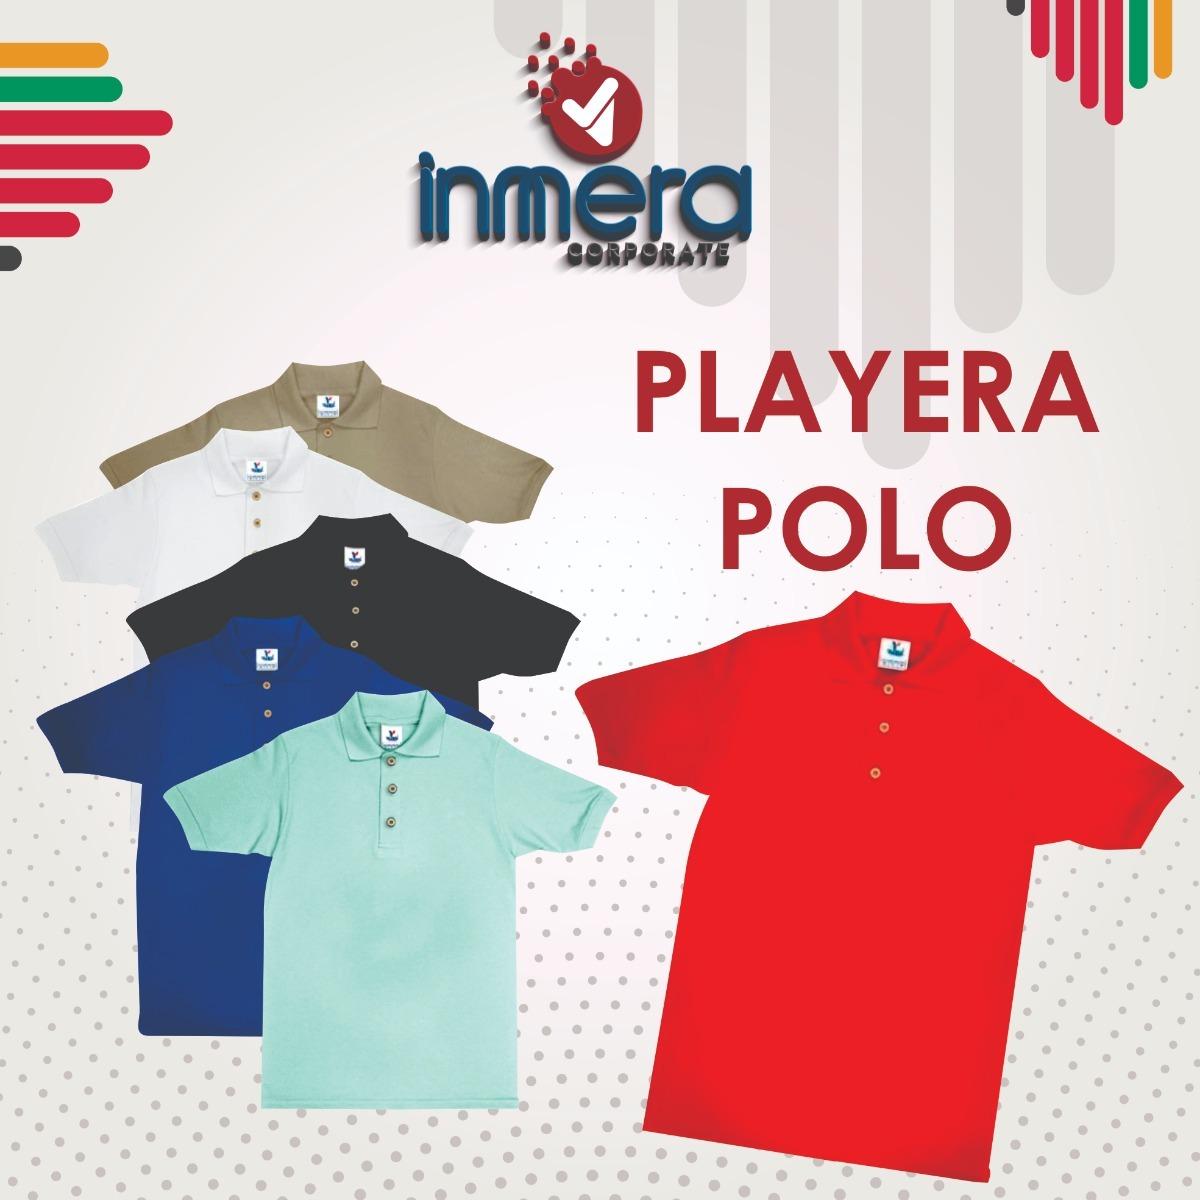 6495eb7b4f96a Playera Polo Yazbek -   95.00 en Mercado Libre